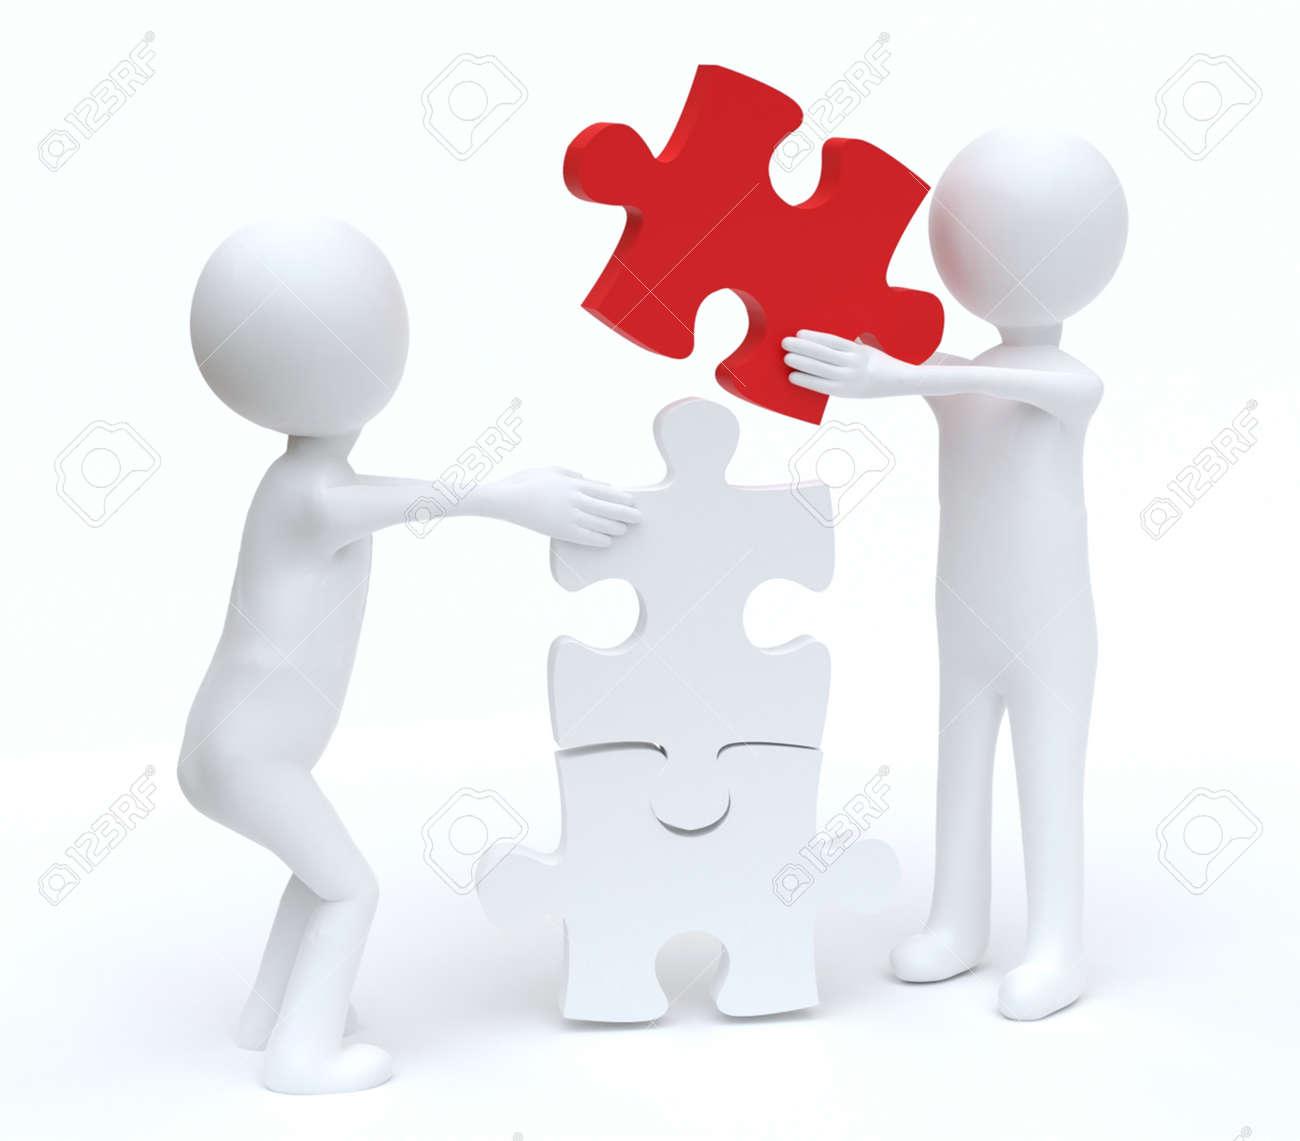 Teamwork men building Jigsaw puzzle - 165233563